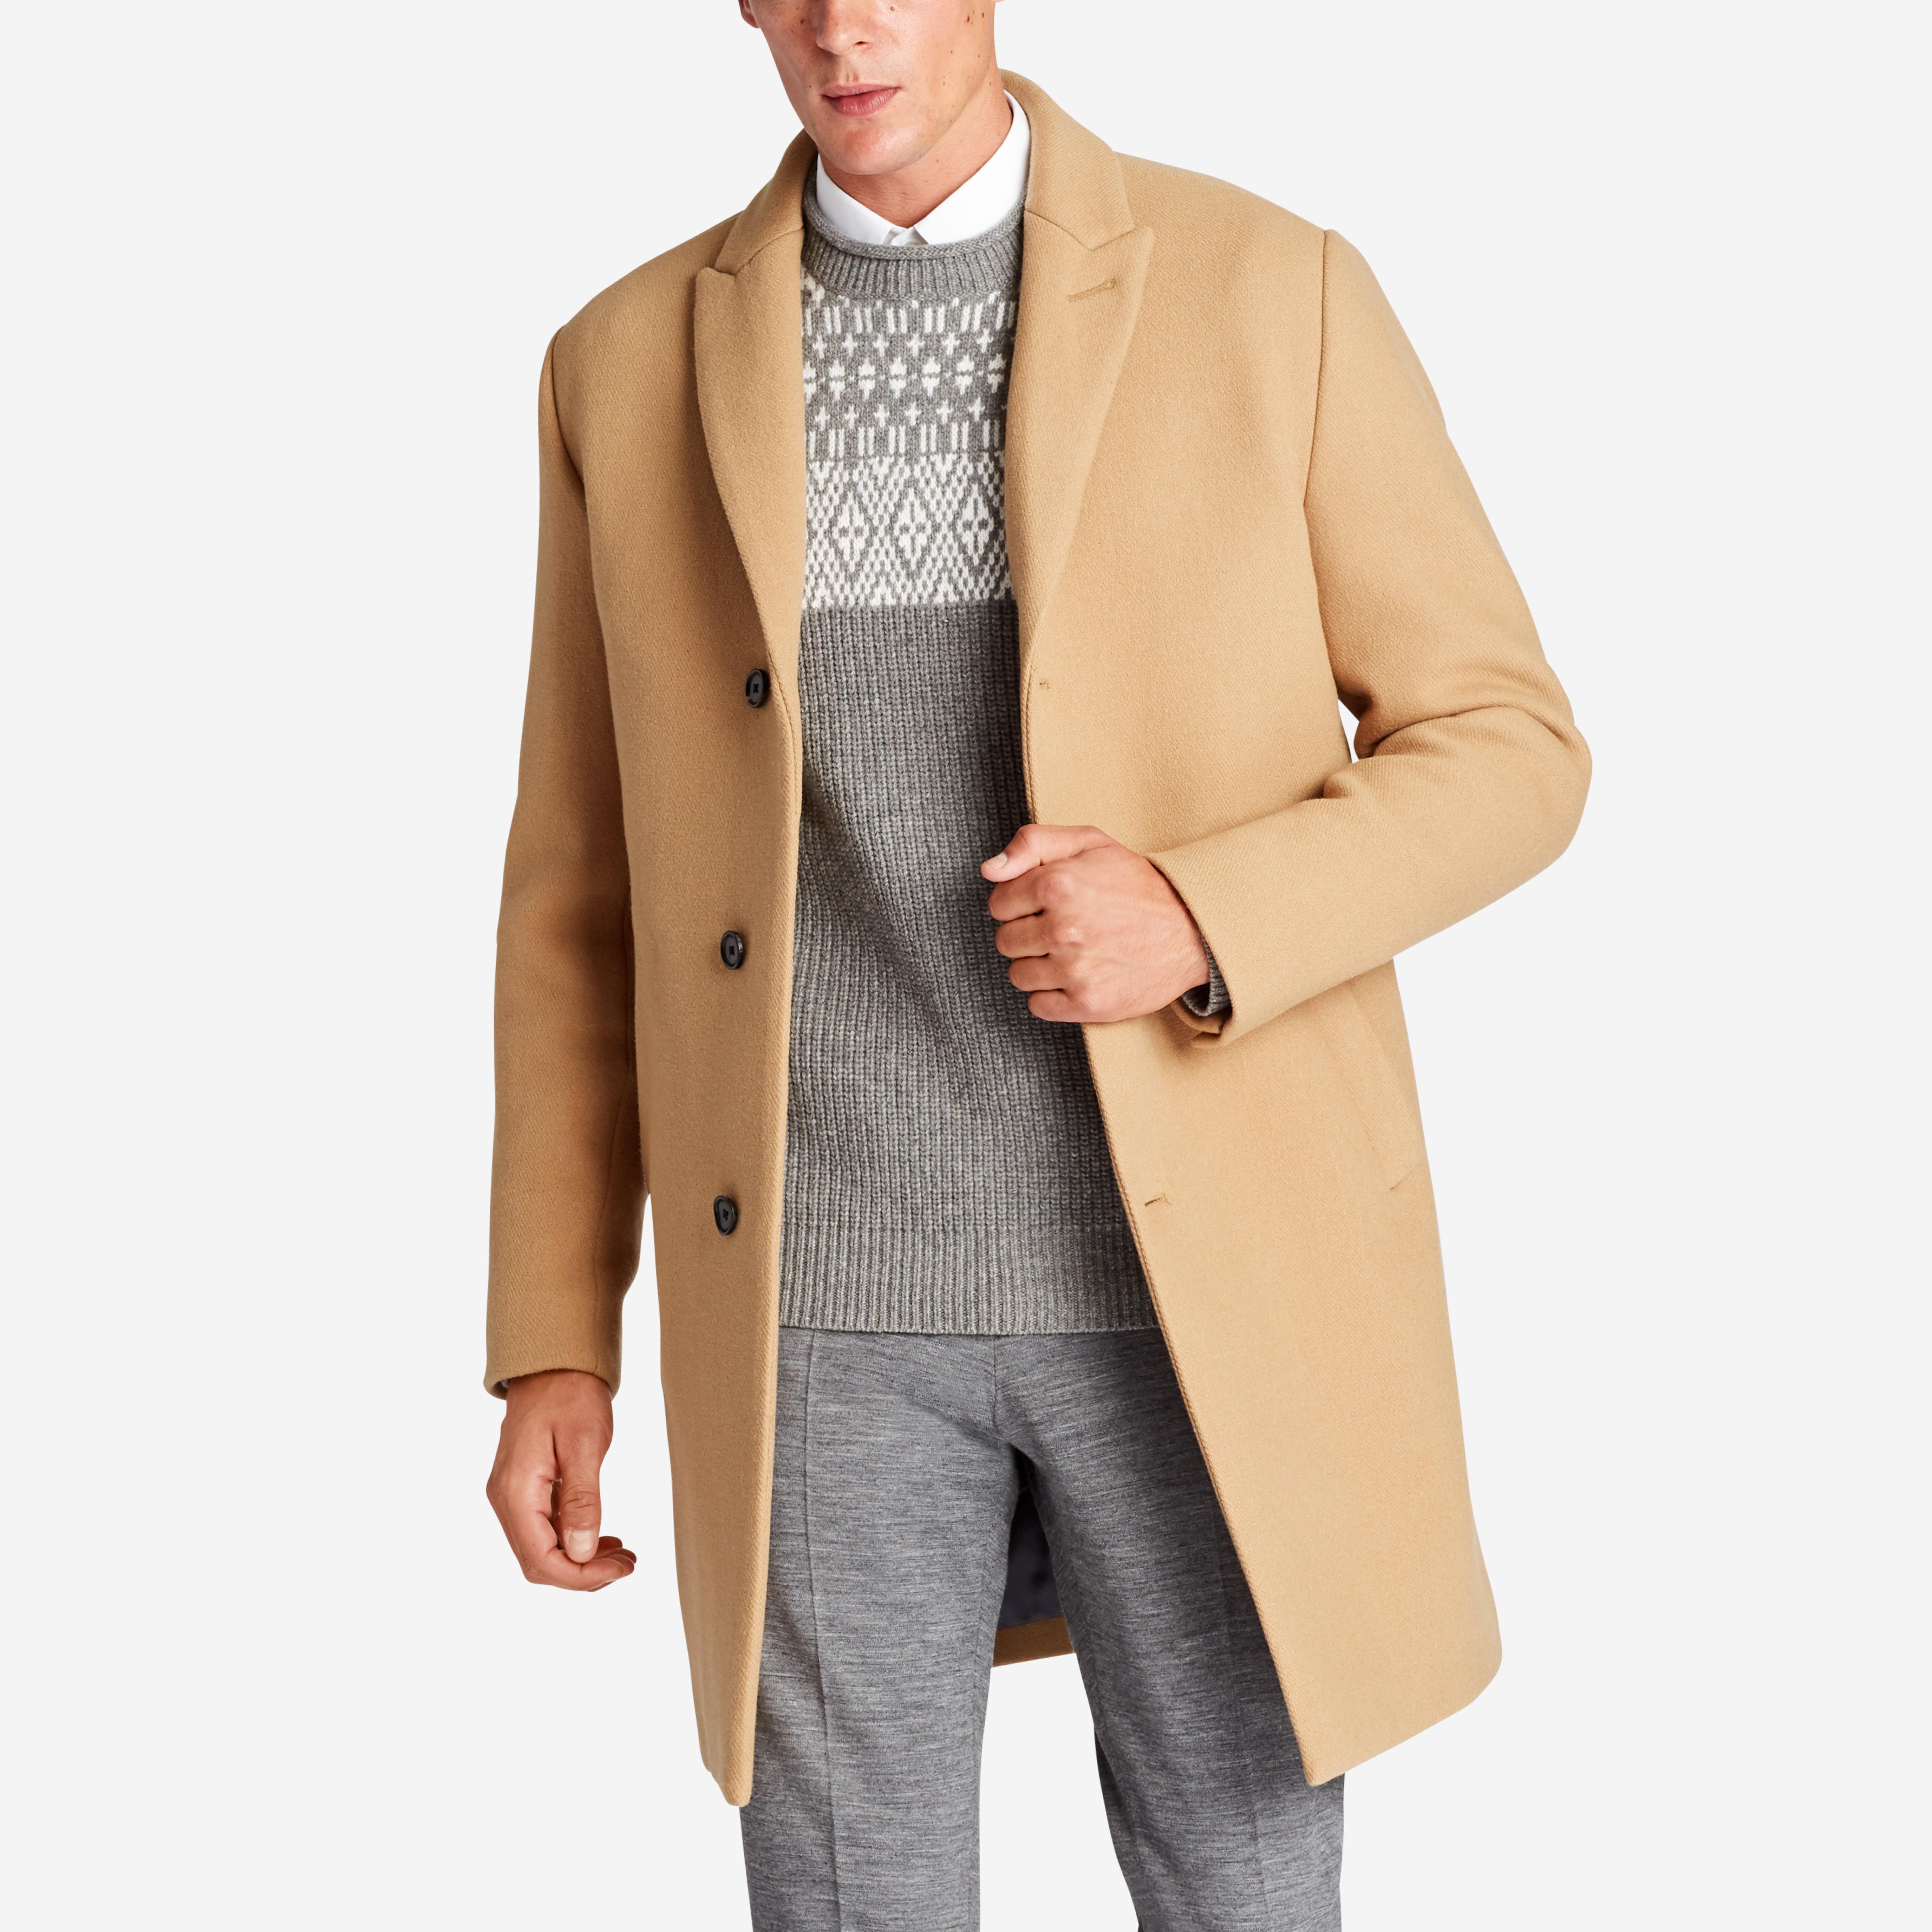 The Stretch Italian Wool Topcoat